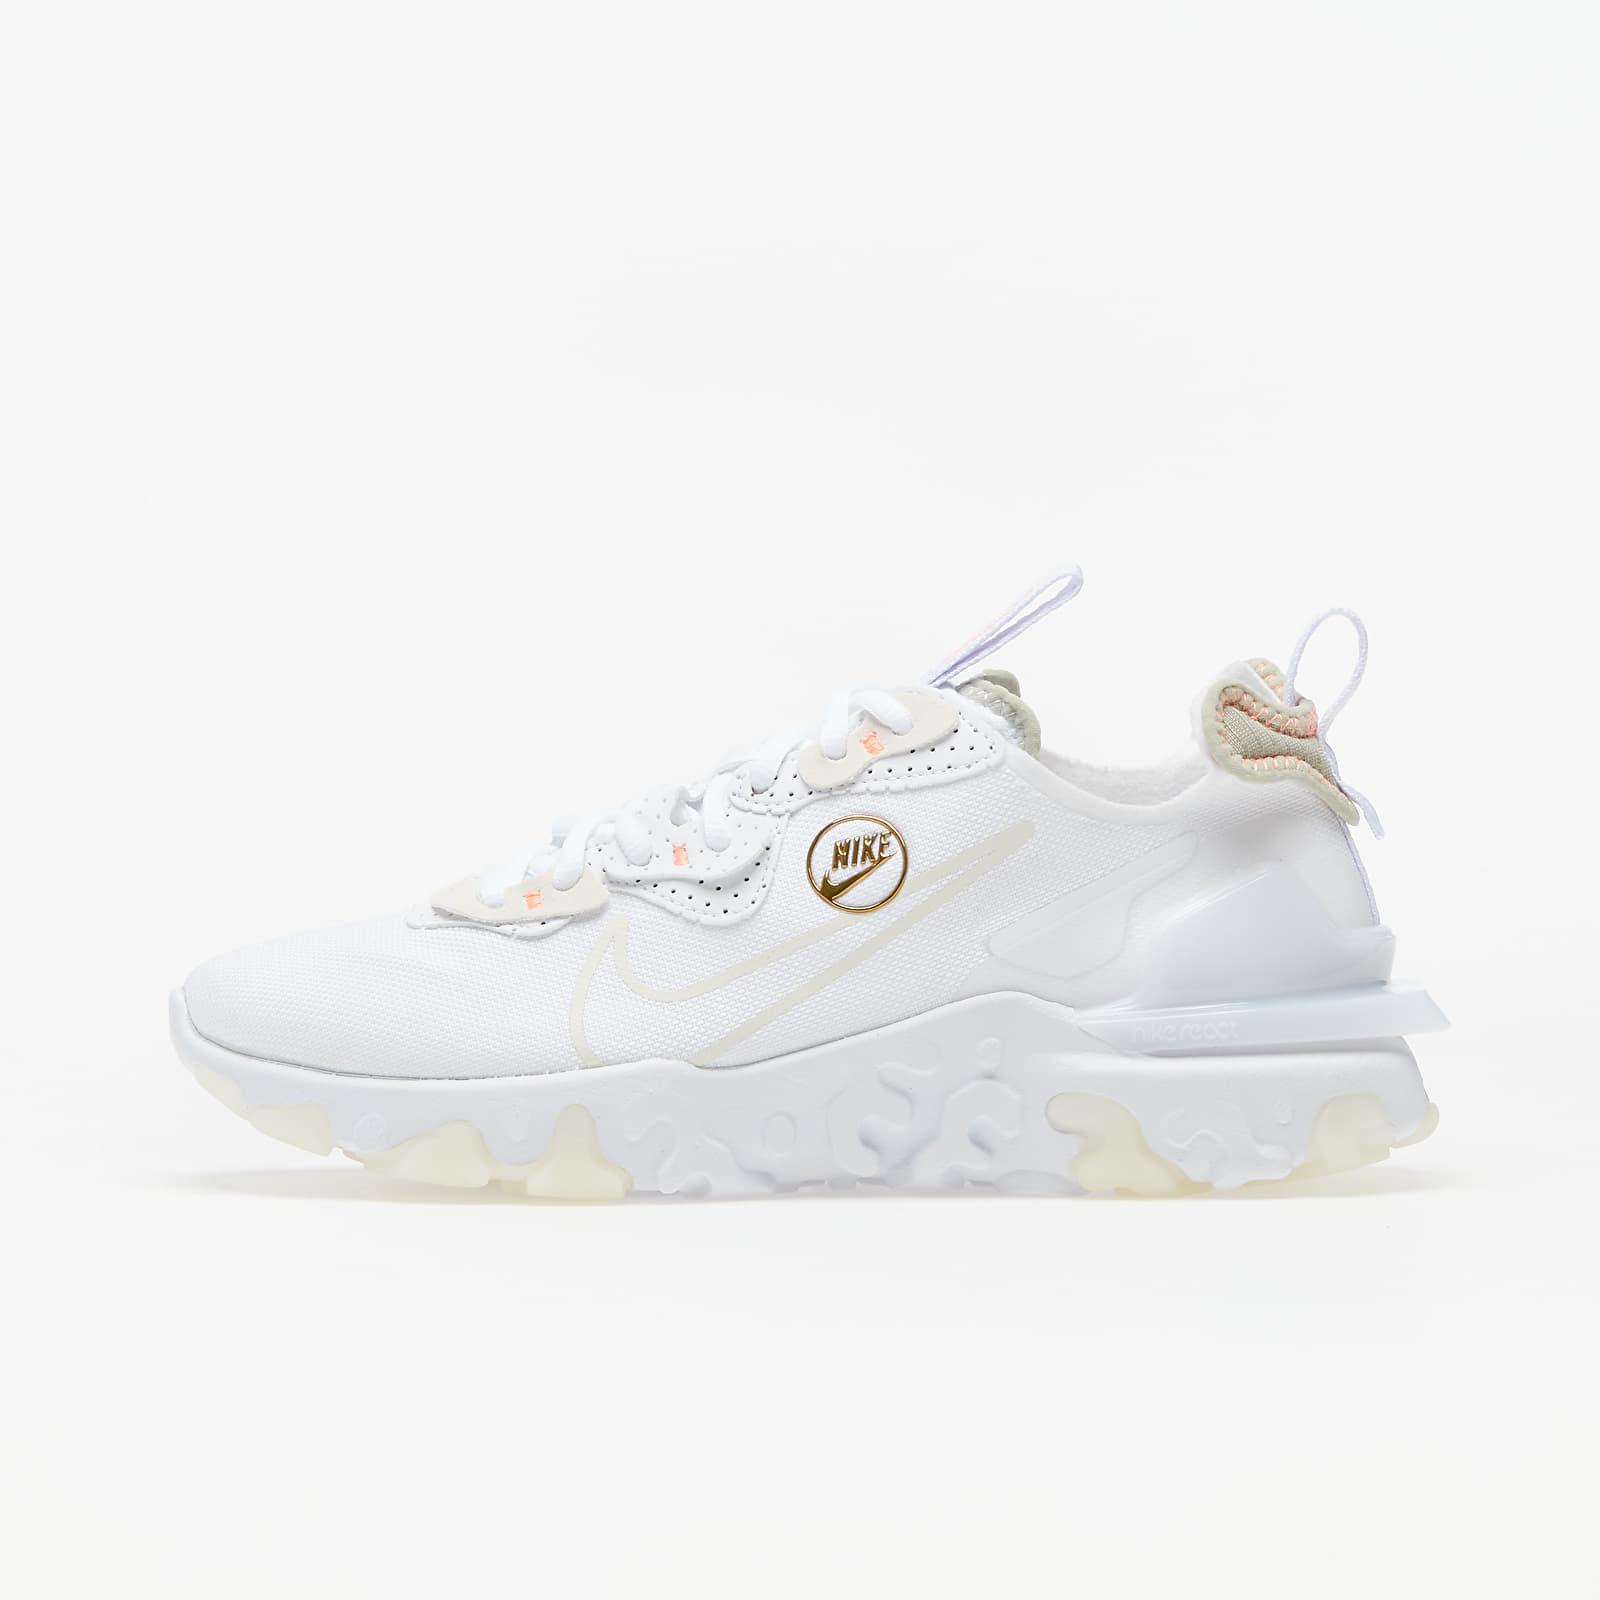 Încălțăminte și sneakerși pentru femei Nike Wmns React Vision White/ Sail-Stone-Atomic Pink